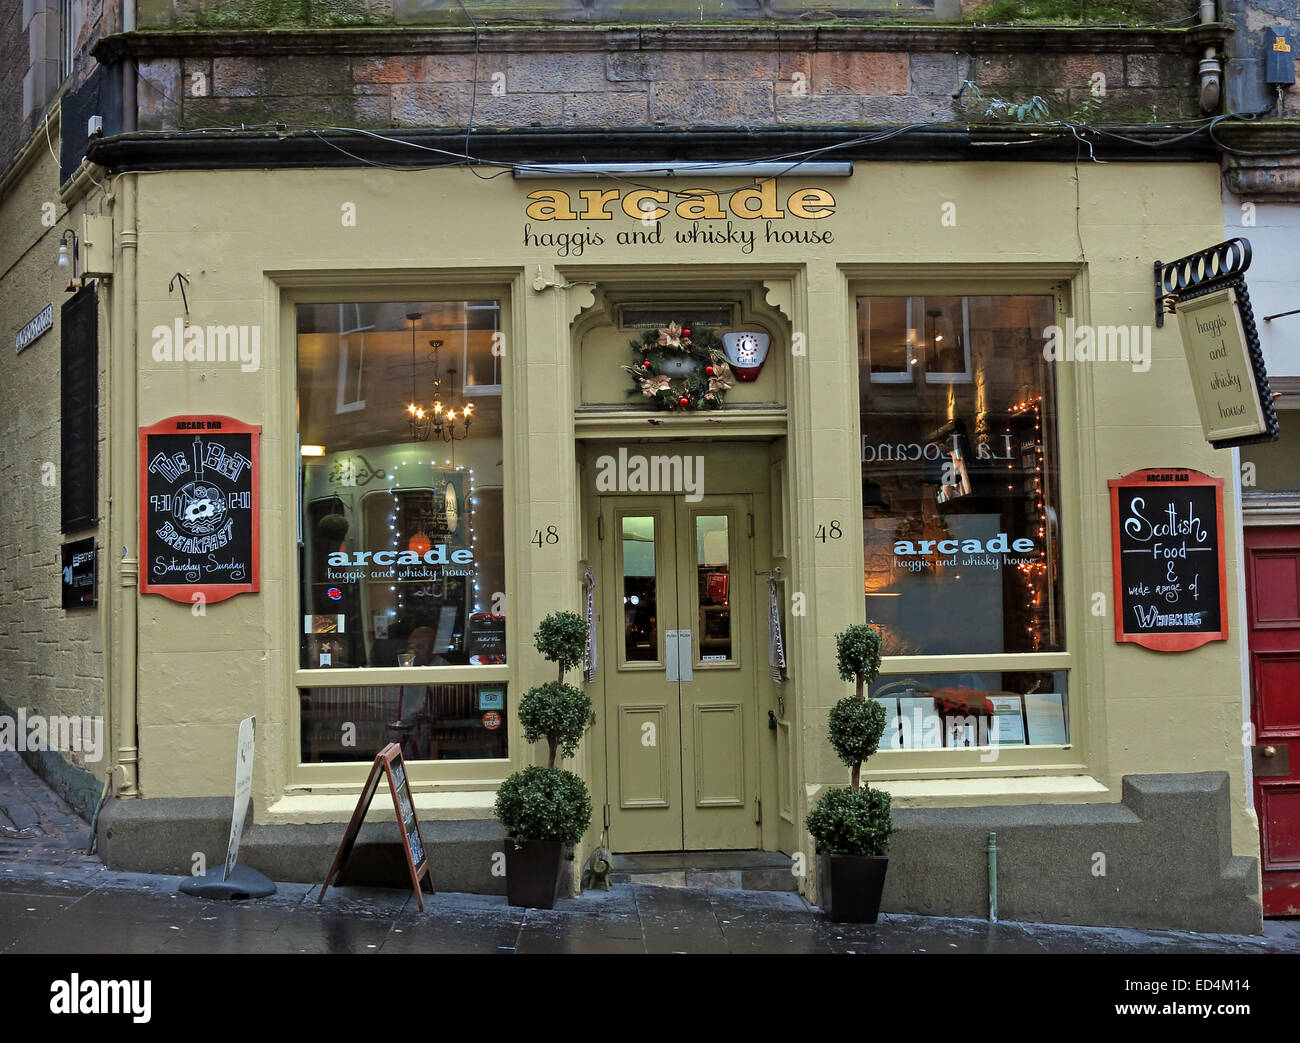 Laden Sie dieses Alamy Stockfoto Arcade-Edinburgh Haggis & Whisky House, Scotland, UK - ED4M14